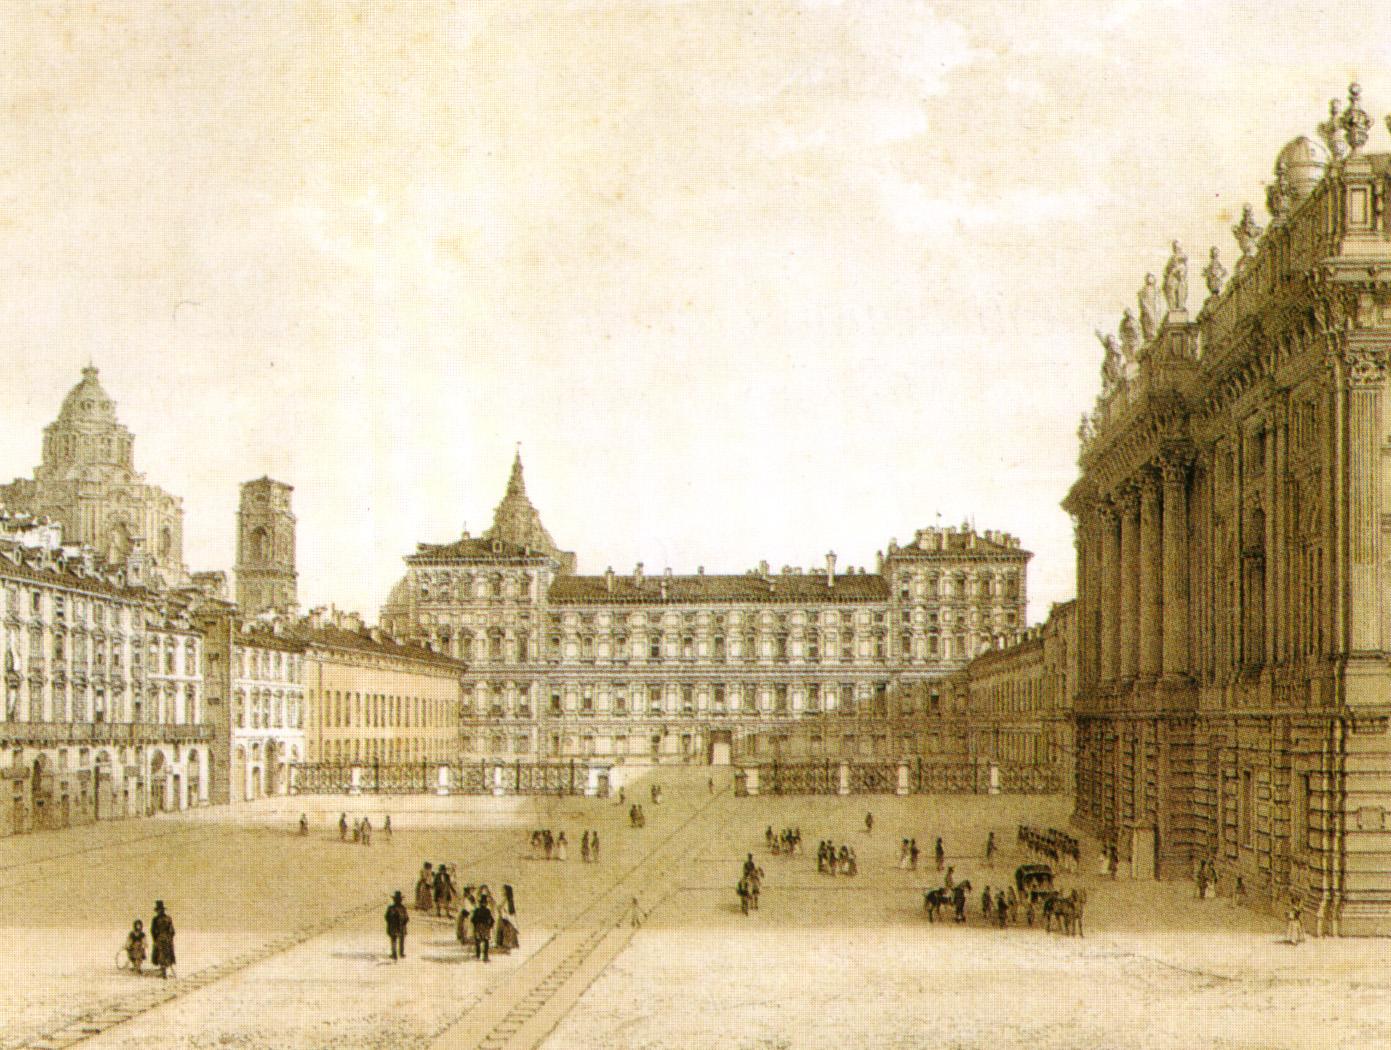 XIX_century_print,_Piazza_castello,_torino